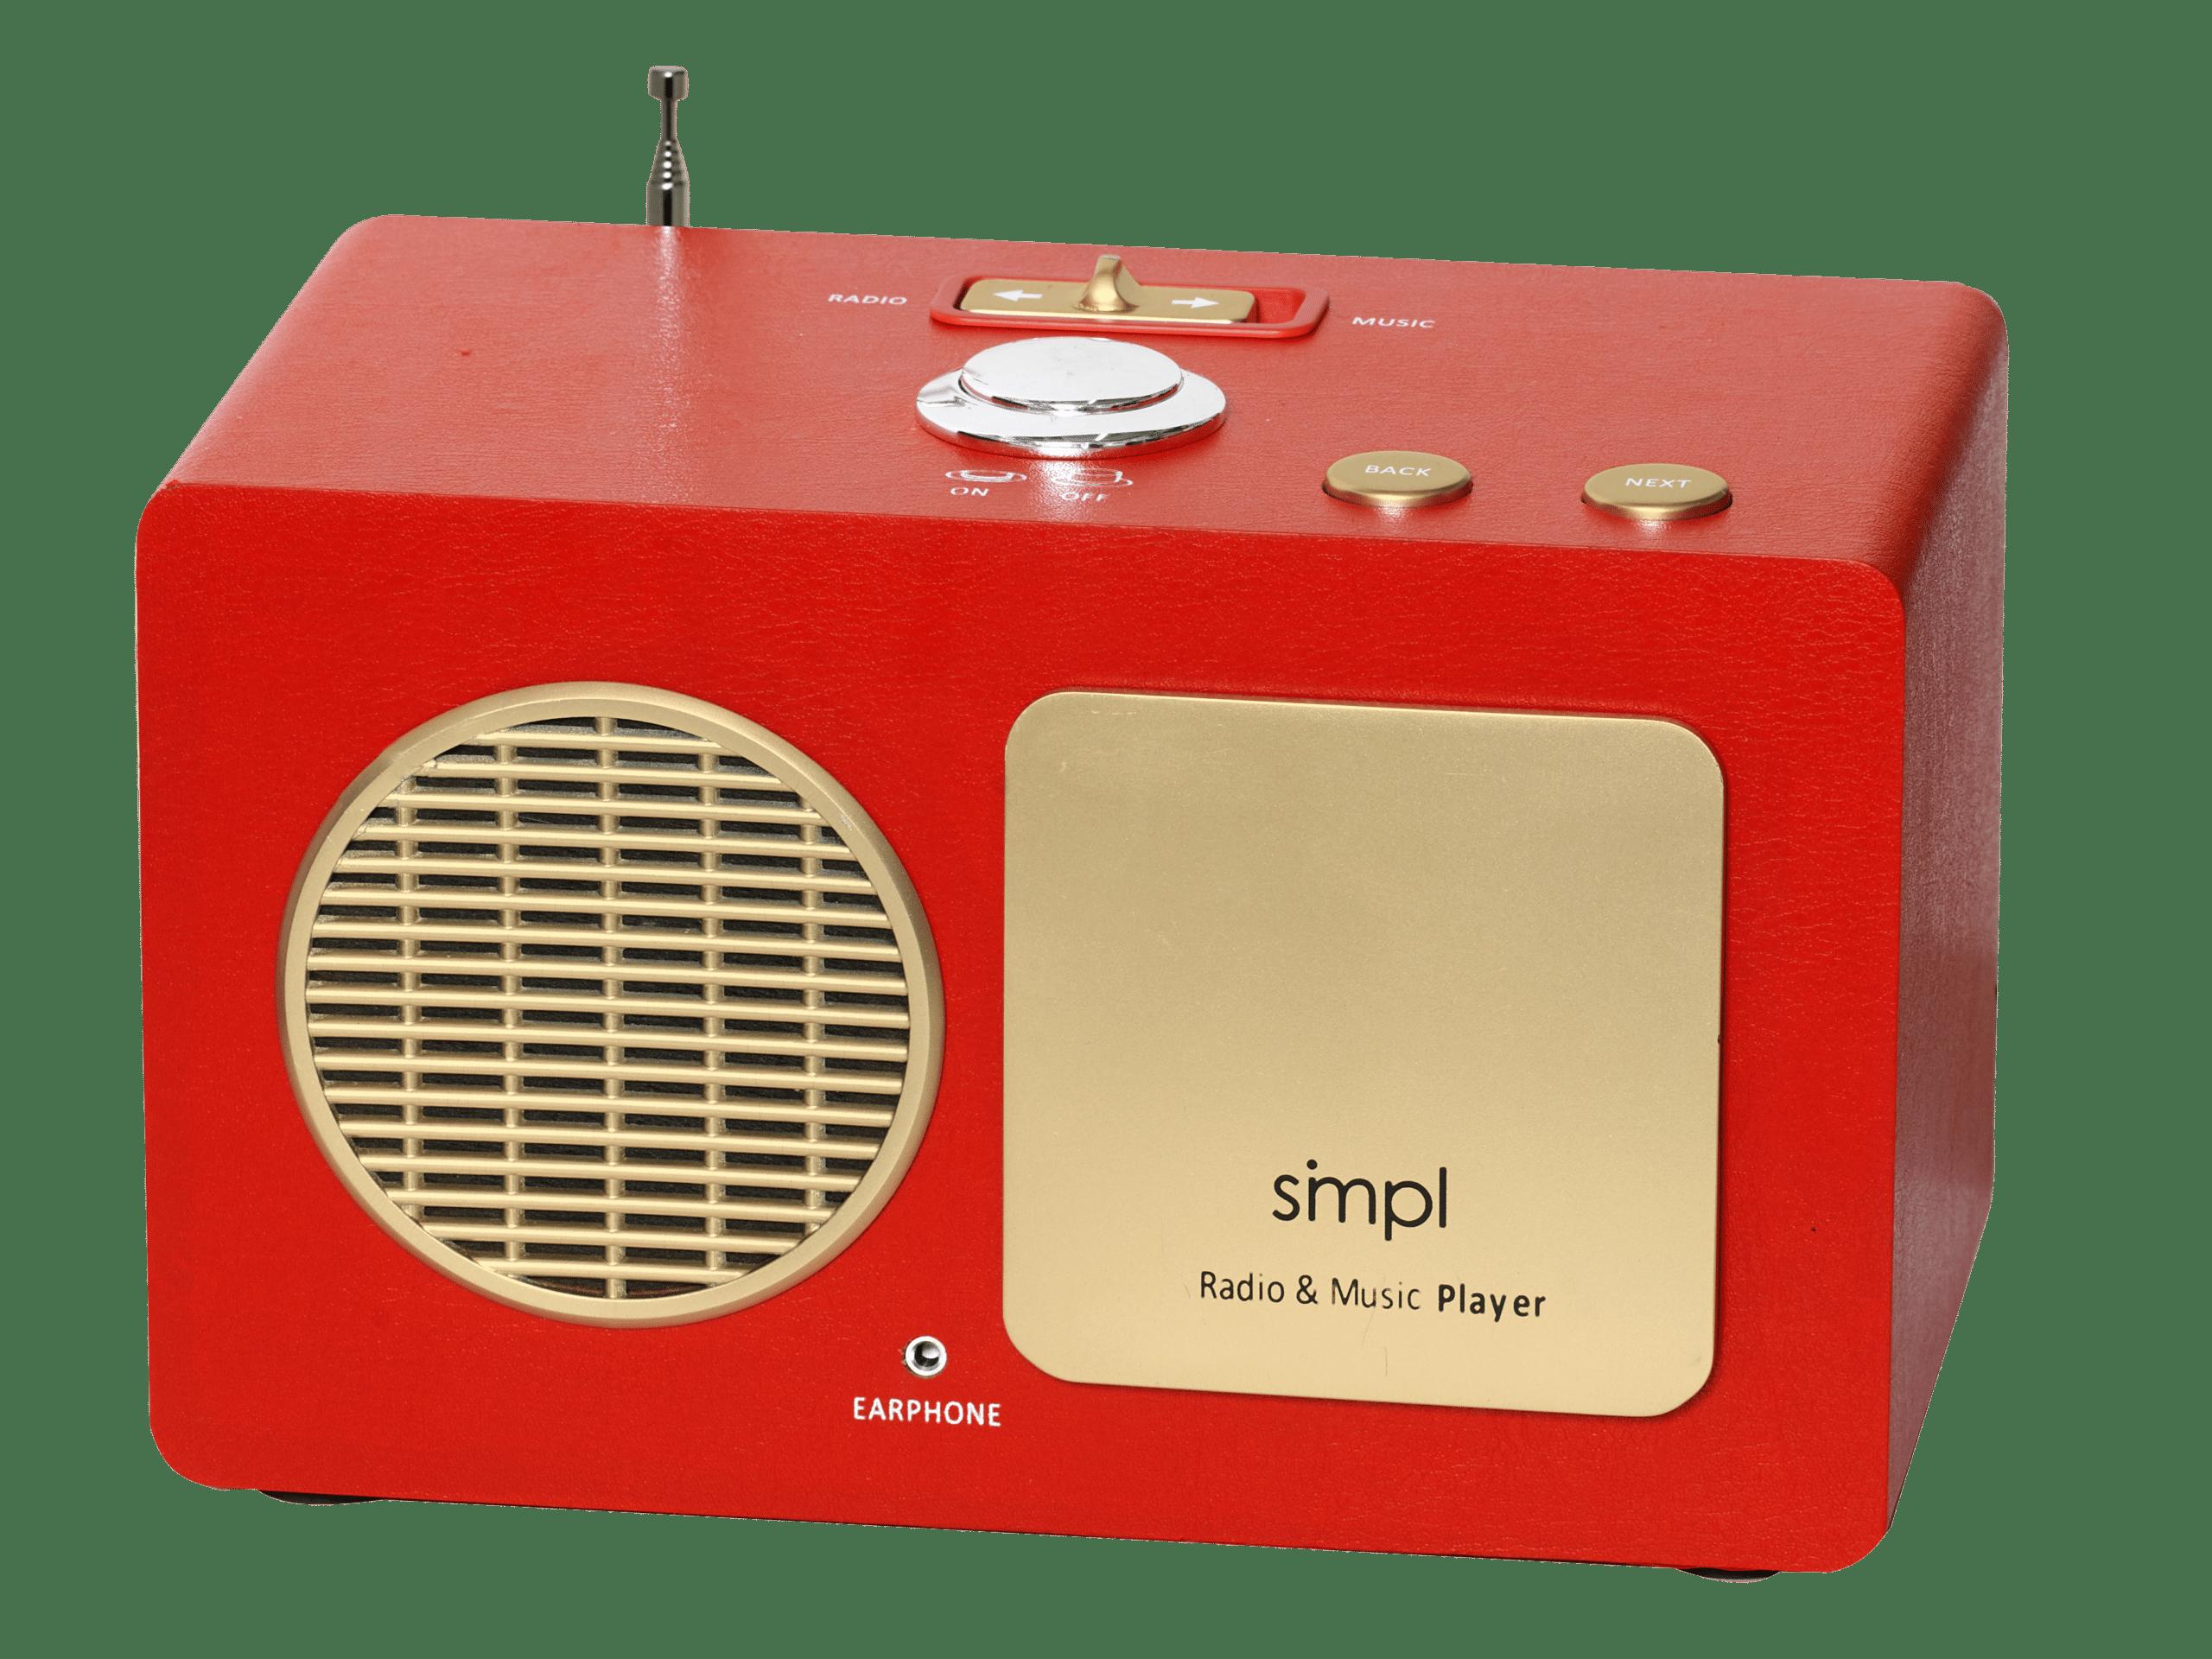 SMPL-radio-player-smpltec